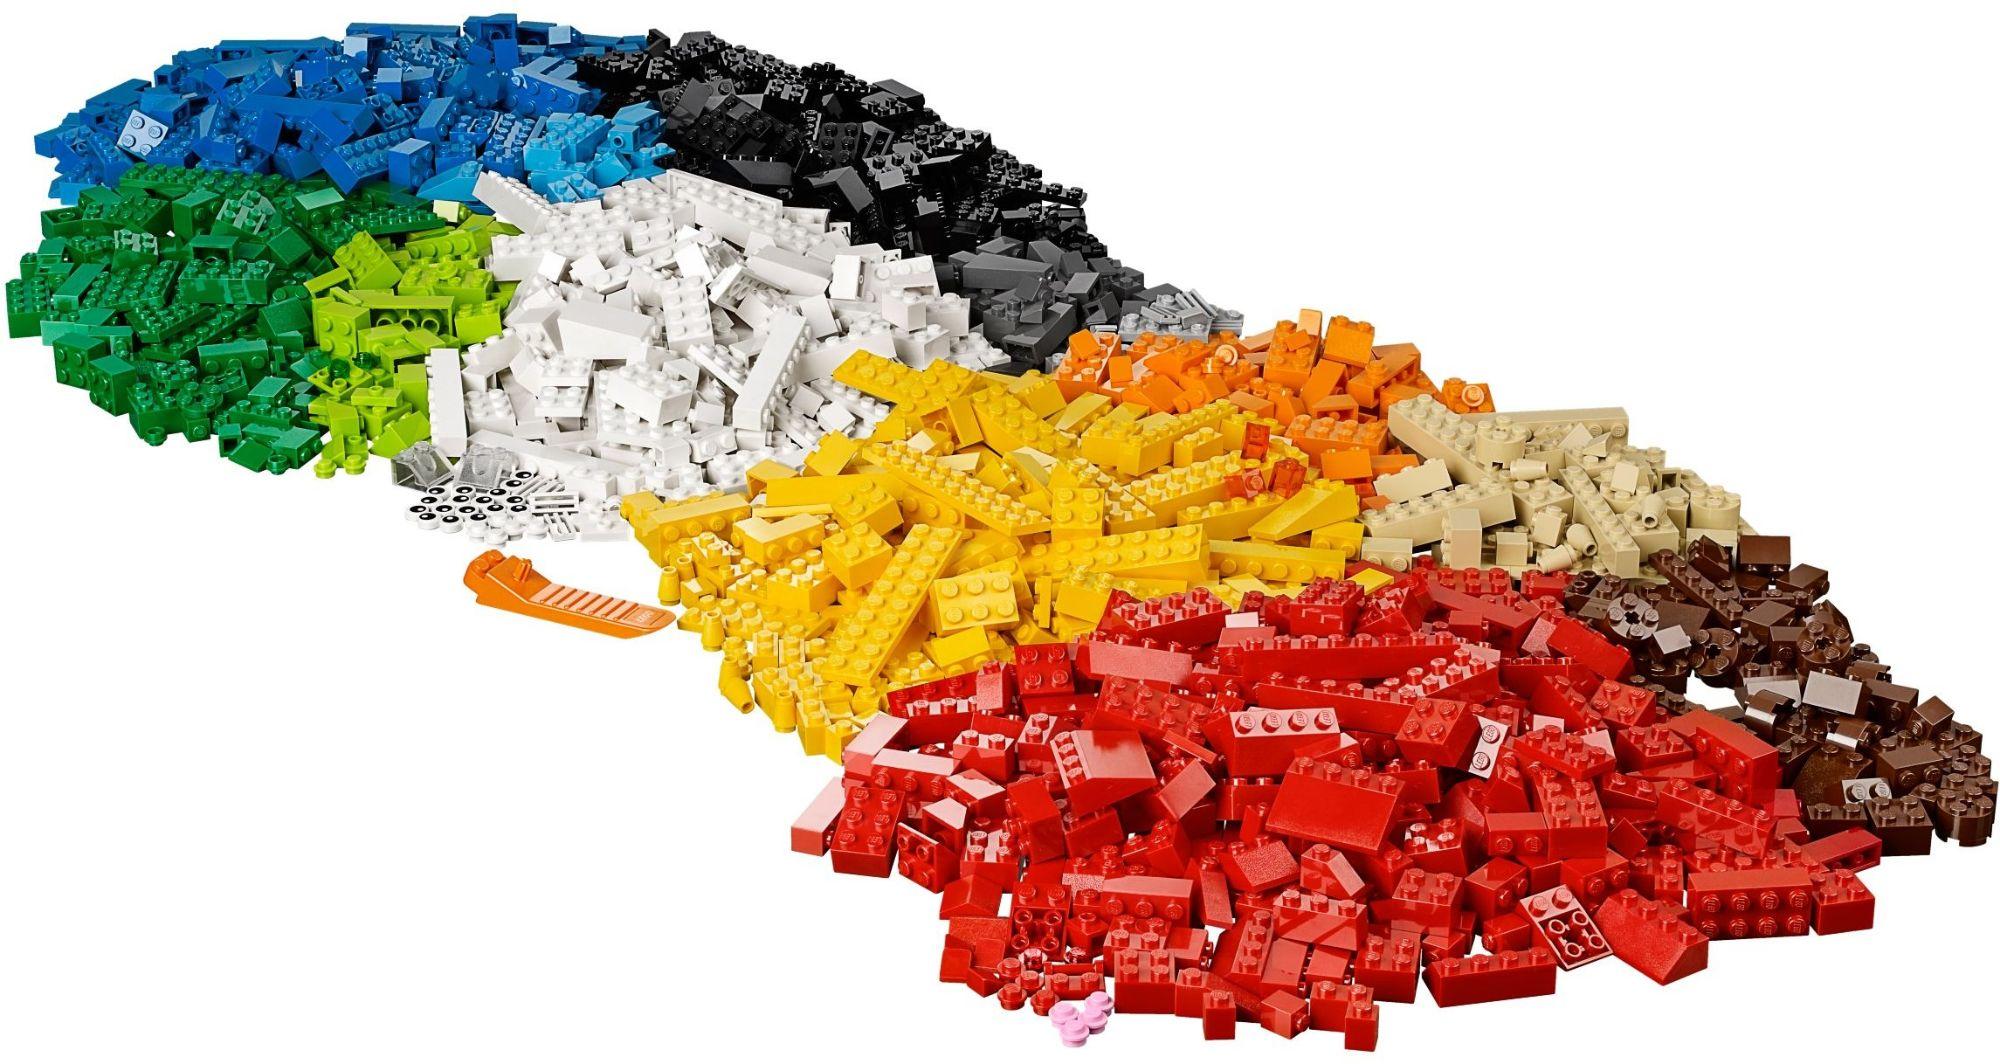 Lot De Pièces Lego En Vrac 1 Kg Lego Rakuten